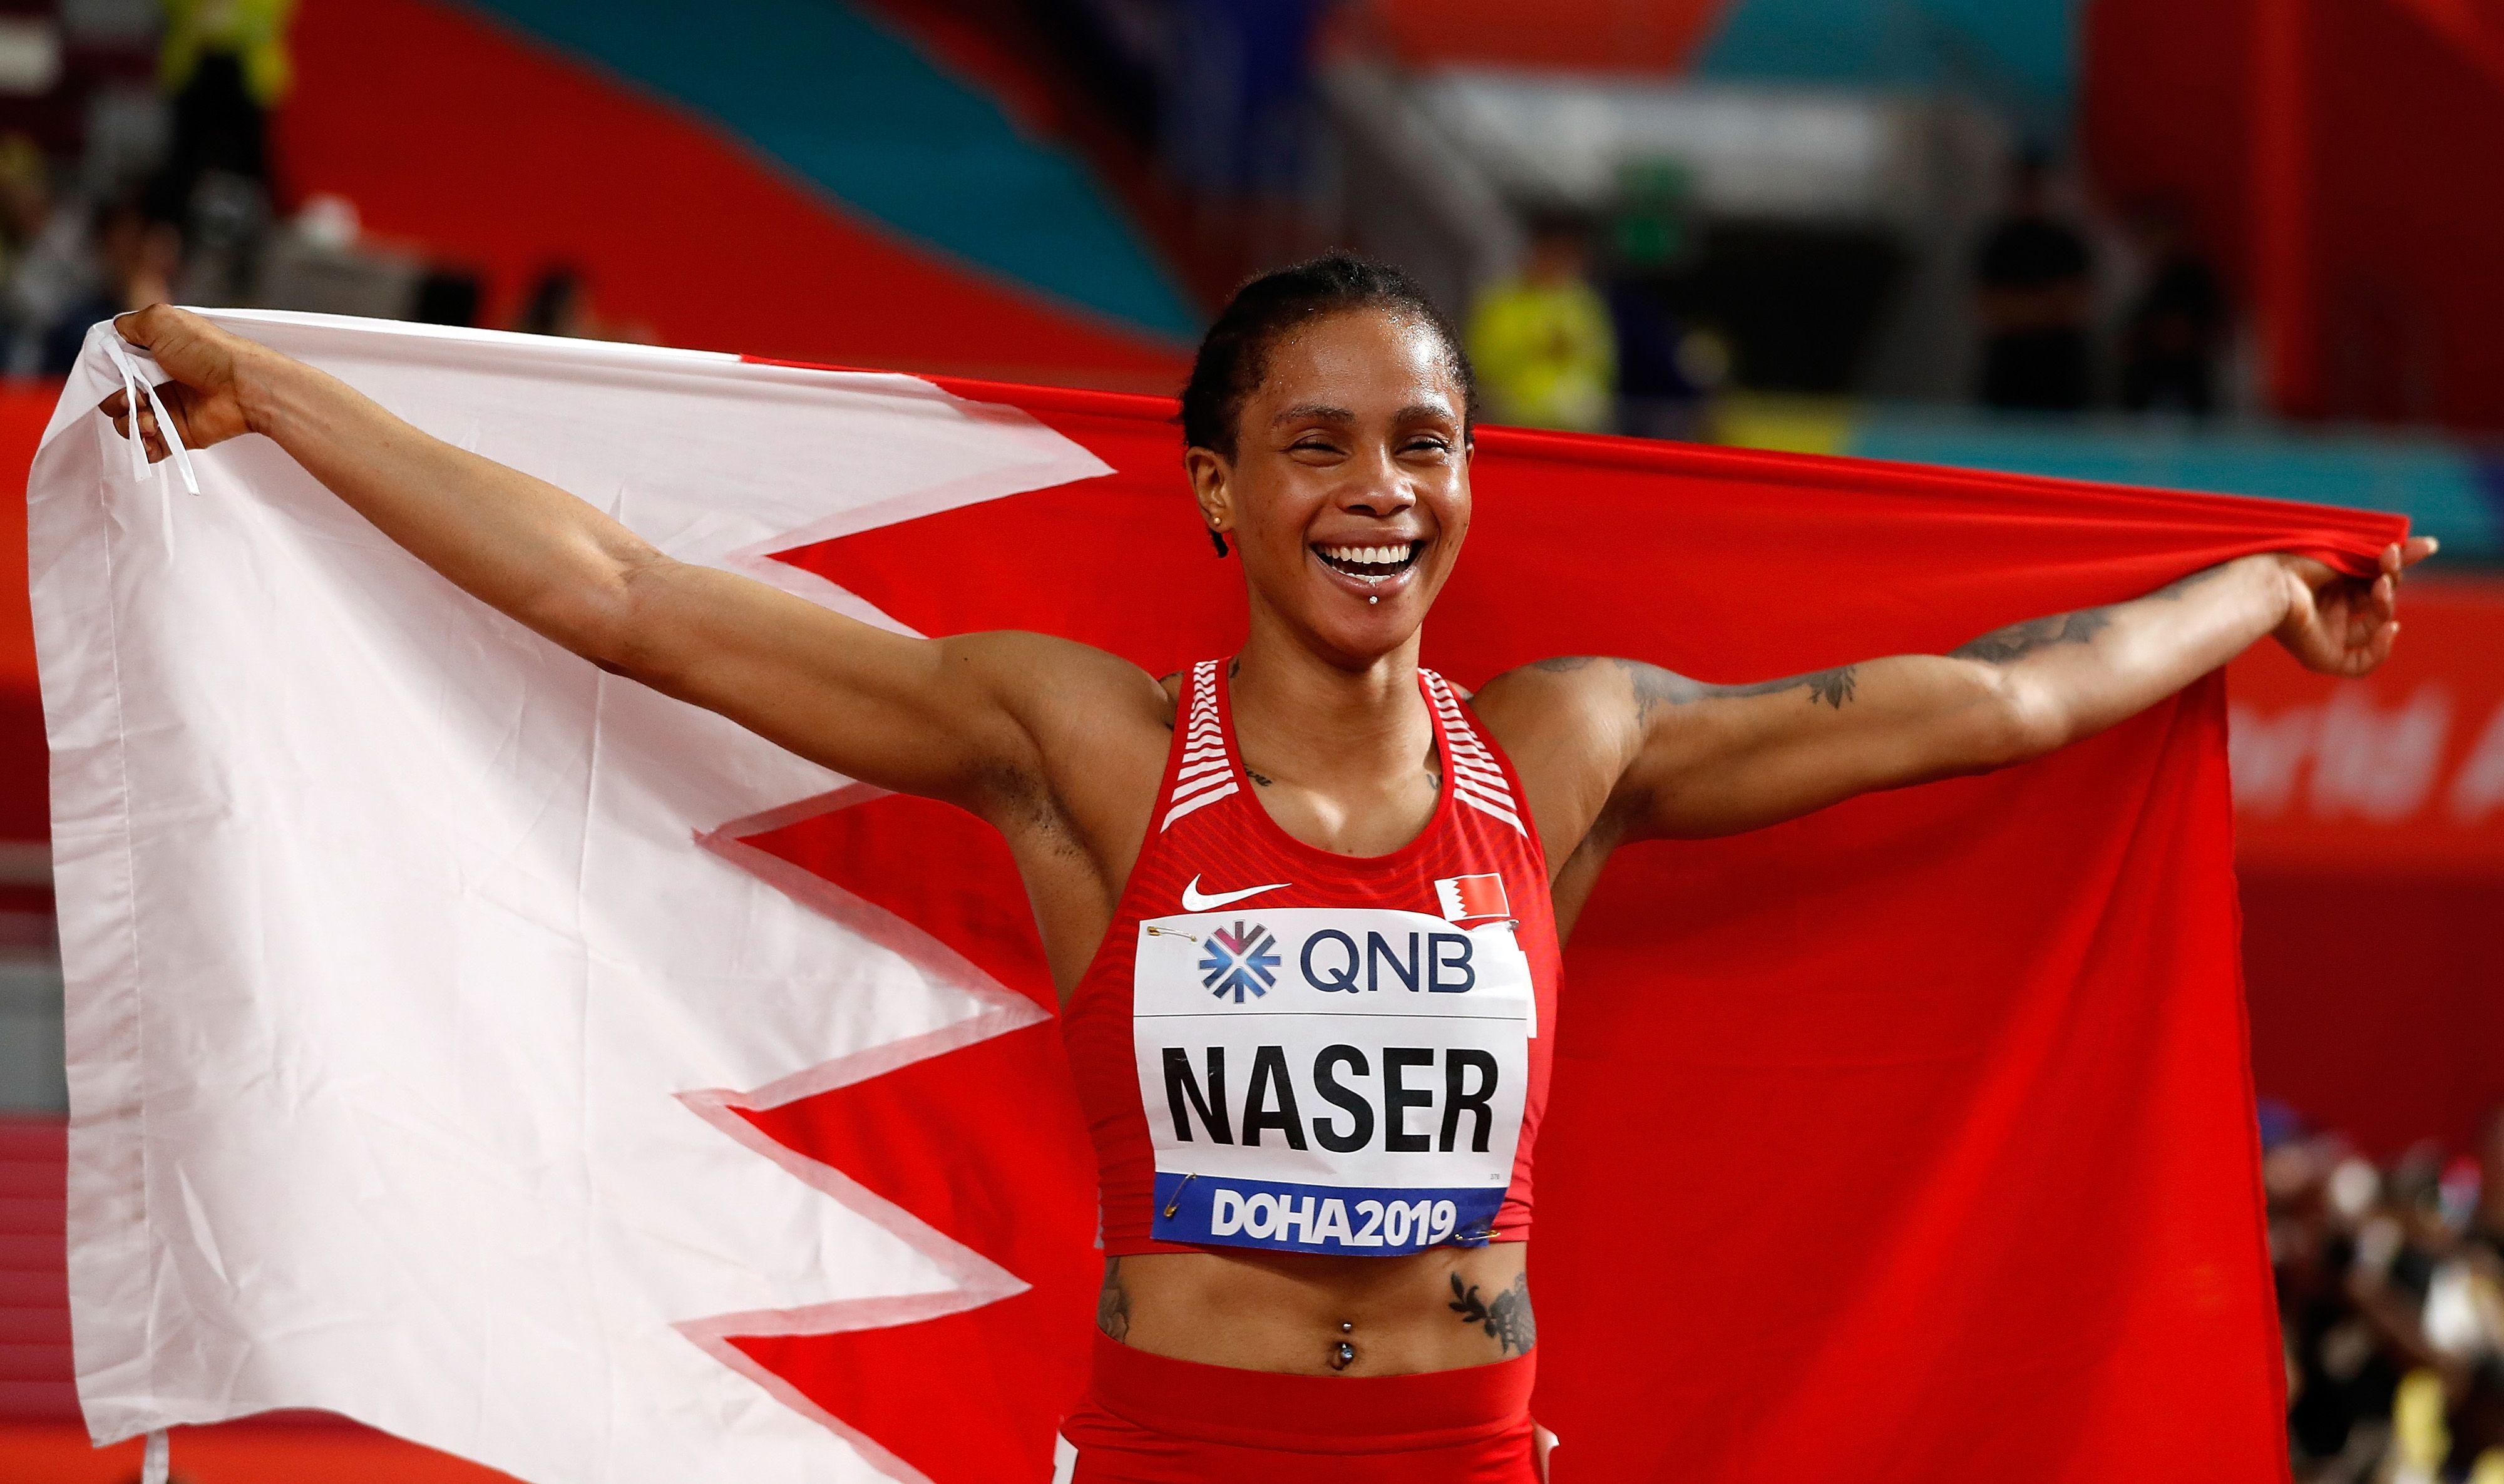 World Athletics Championship, World Athletics Championship latest news, World Athletics Championship Schedule, 400m record, women 400m record, Salwa Eid Naser, Shaunae Mille-Uibo